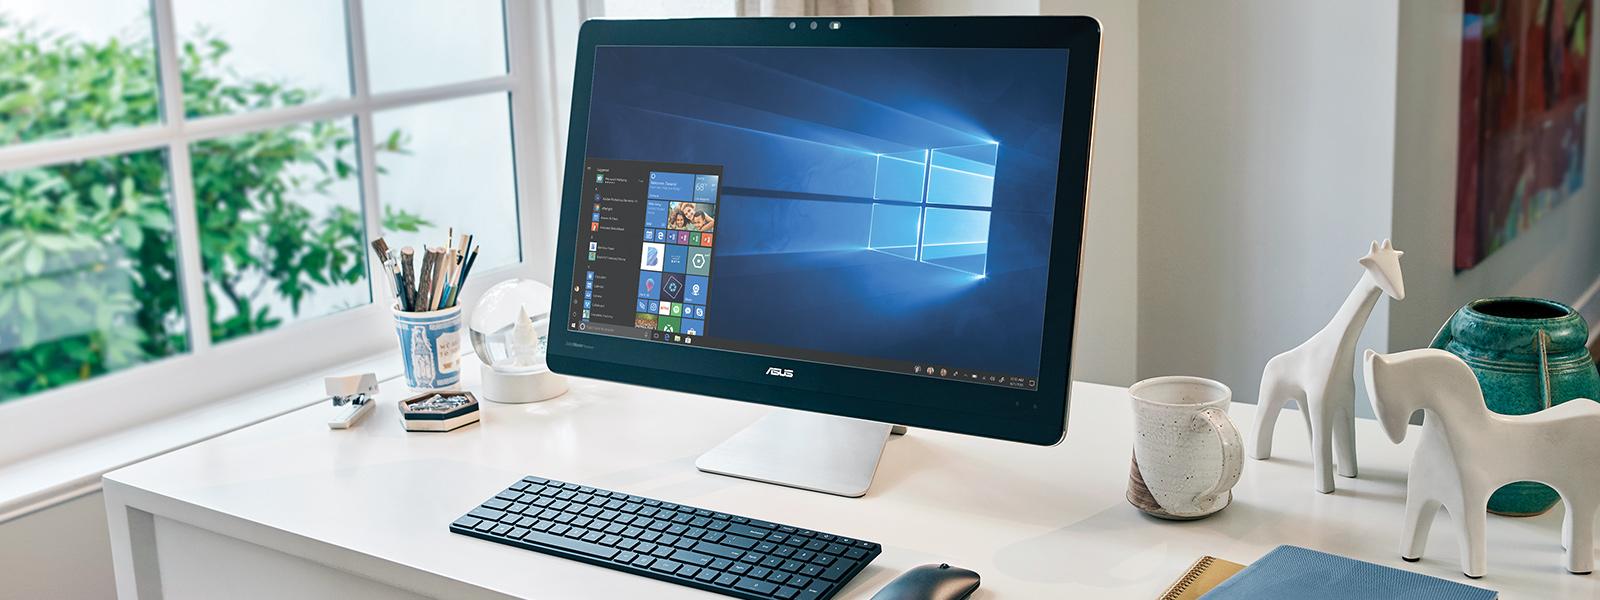 Stolno računalo ASUS na radnom stolu i uz njega bežični miš i tipkovnica